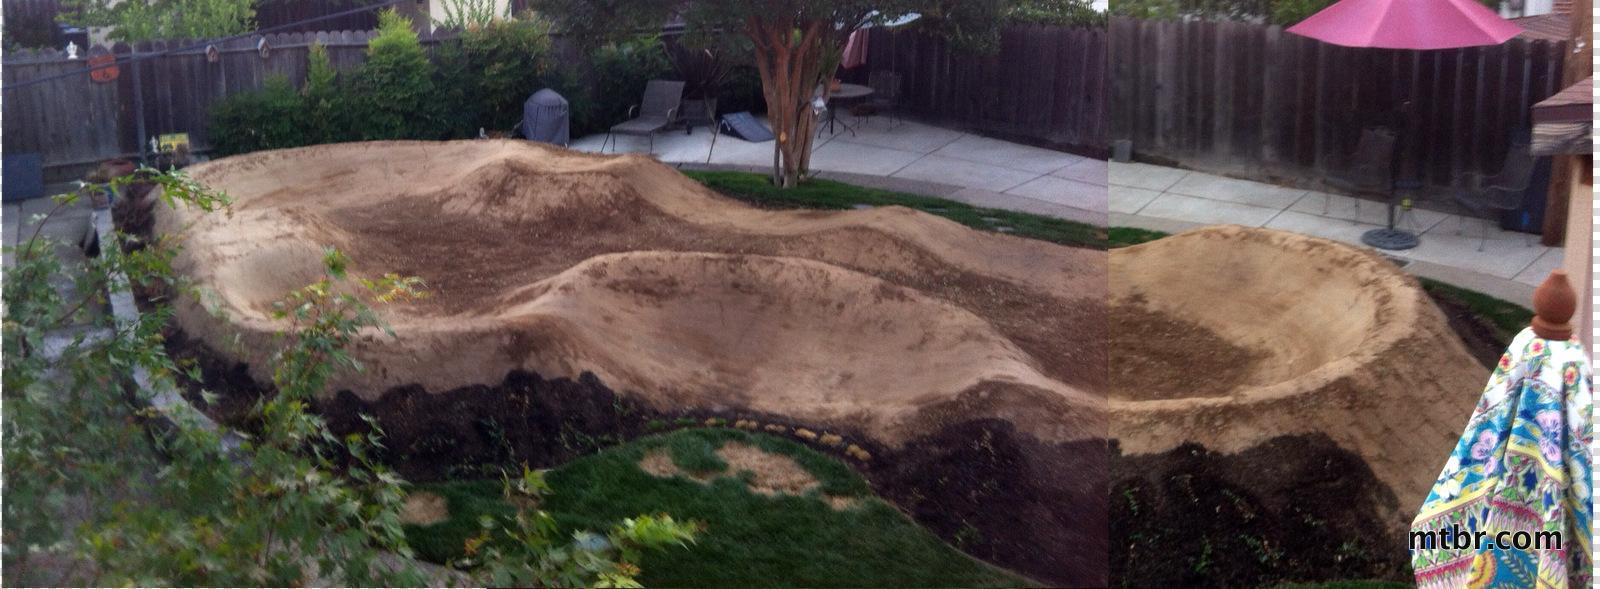 Lodi pump Track